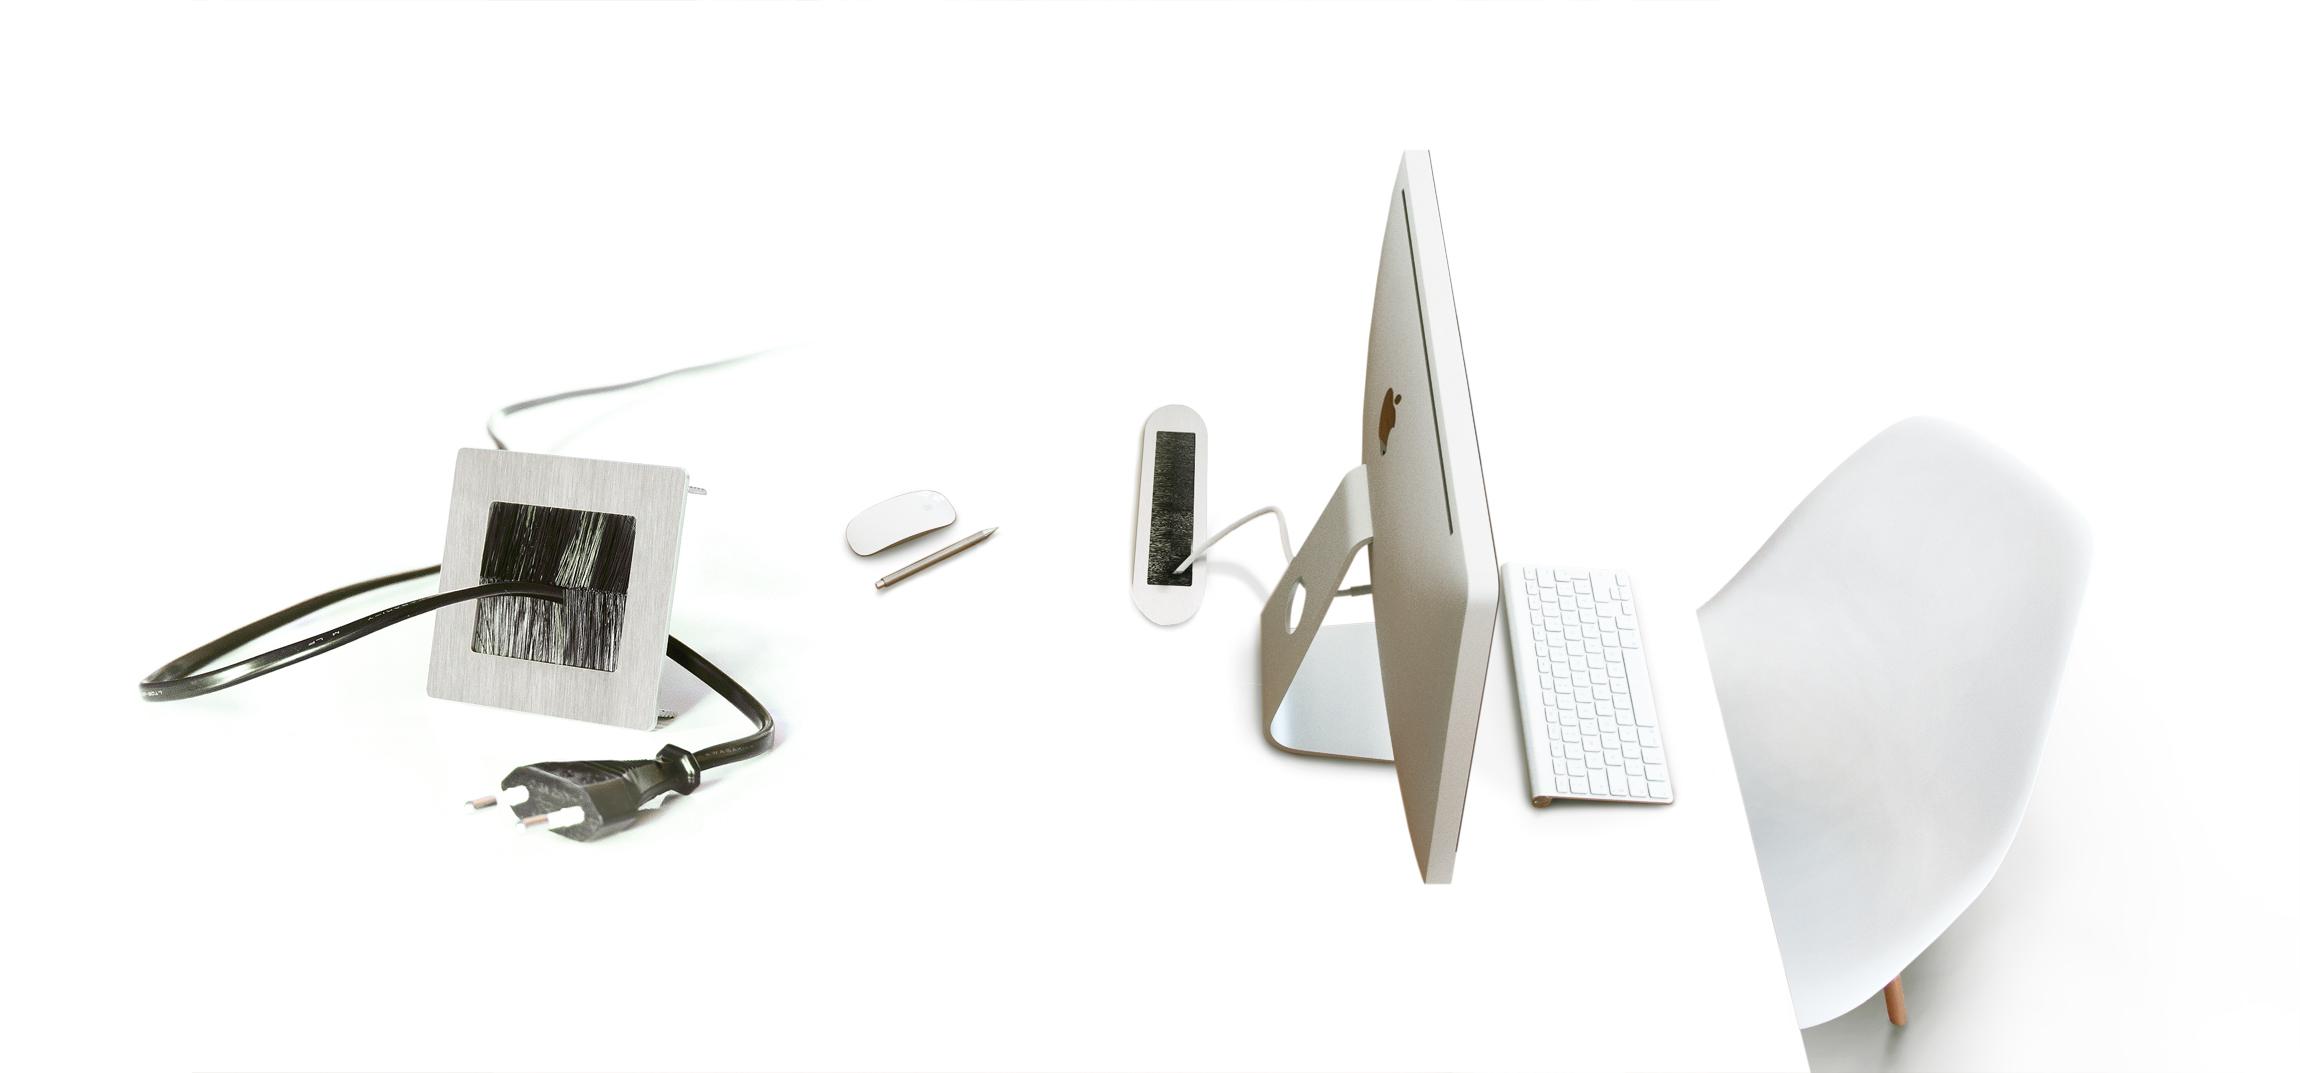 Full Size of Pe Systeme Aluminiumteile Fr Messebau Bro Wohnzimmer Küchenblende